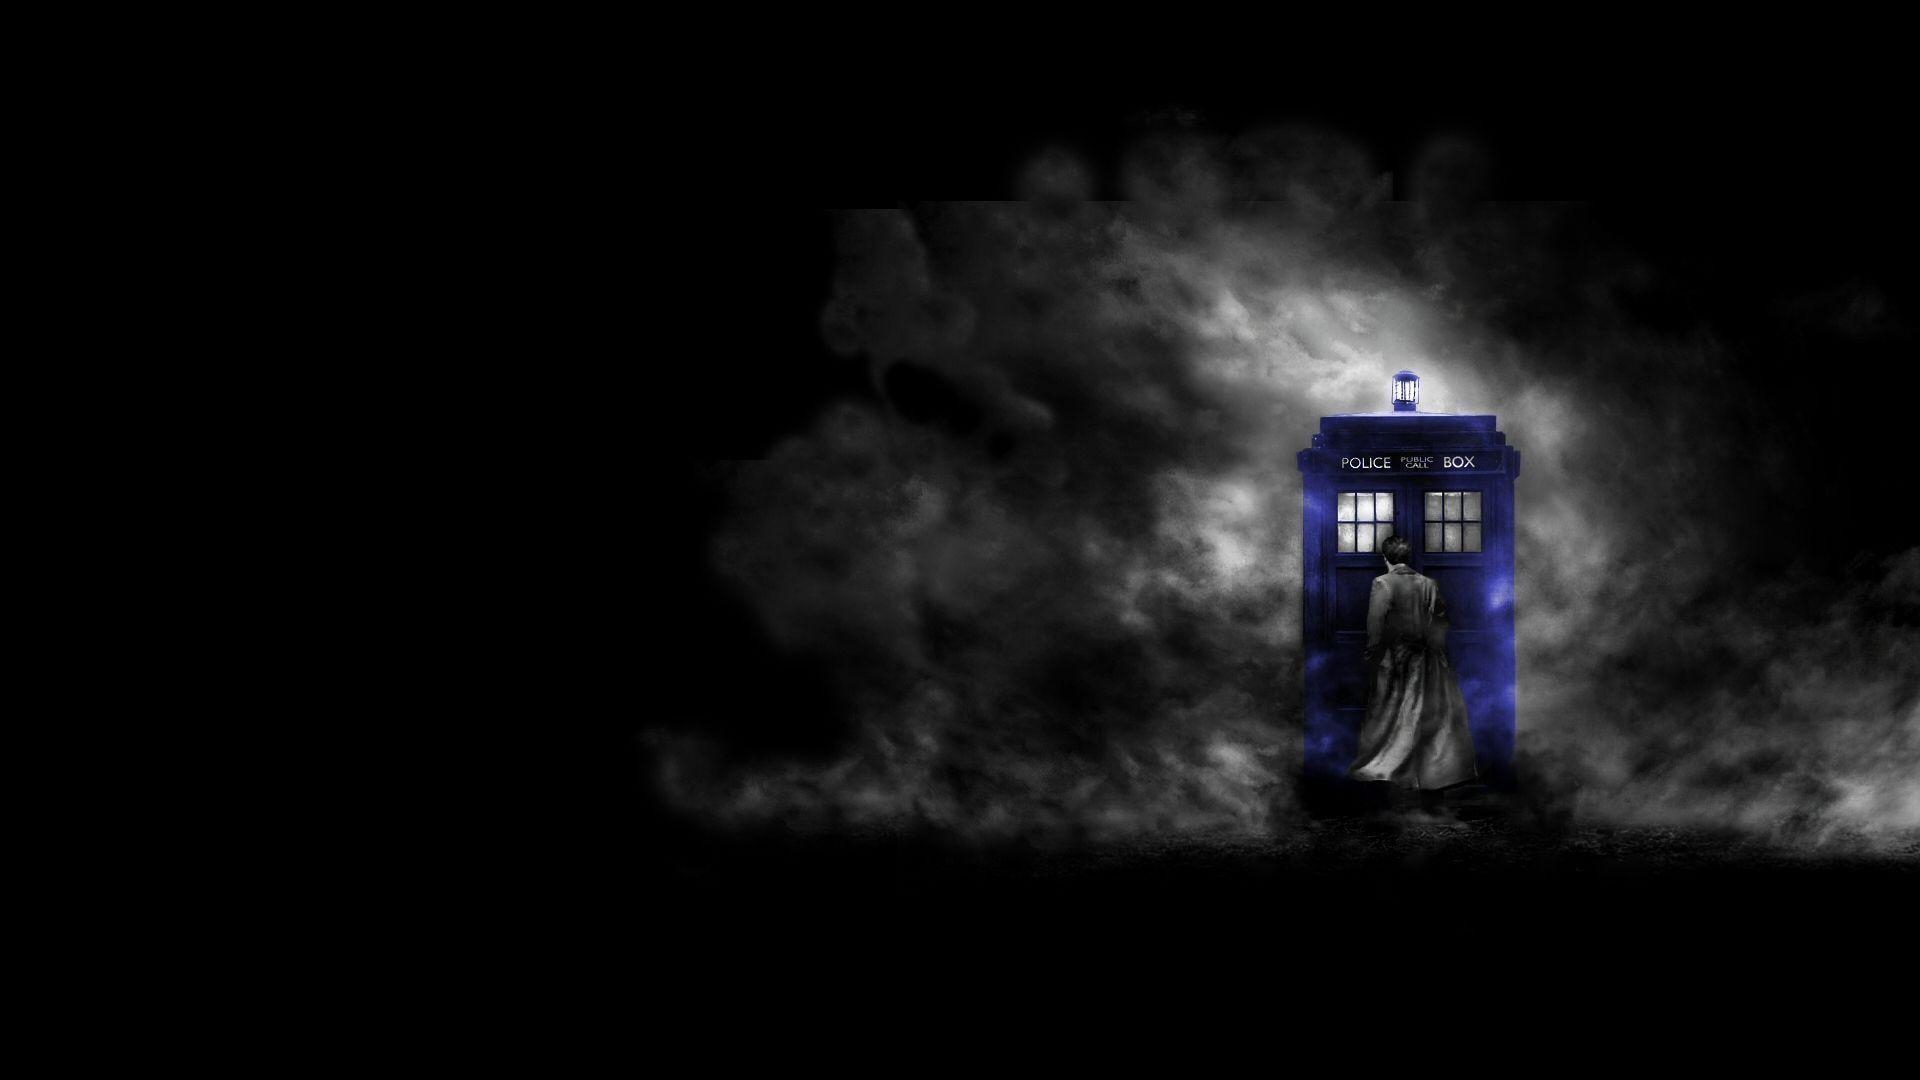 Doctor Who widescreen hd desktop Wallpaper | Hot HD .